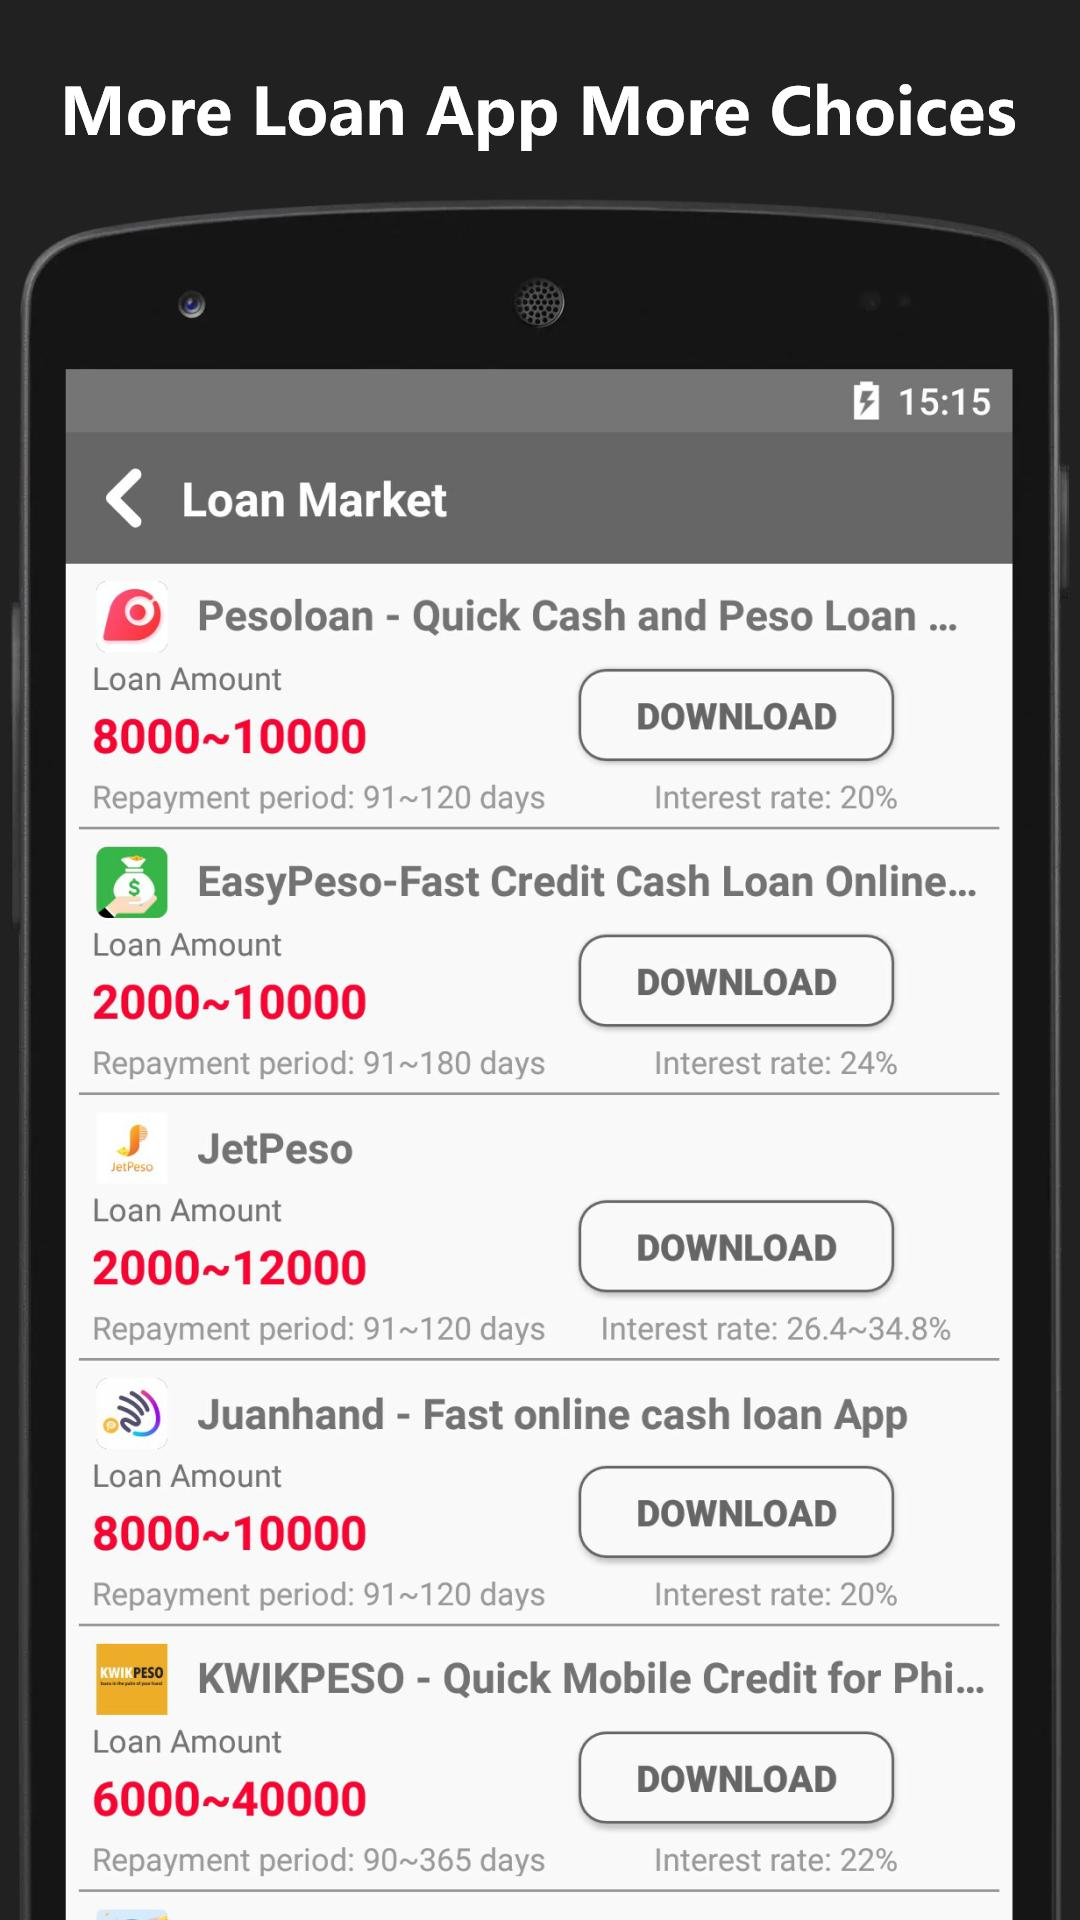 Cash Loan Market - Fast Online Credit Payday Loans : Amazon.de